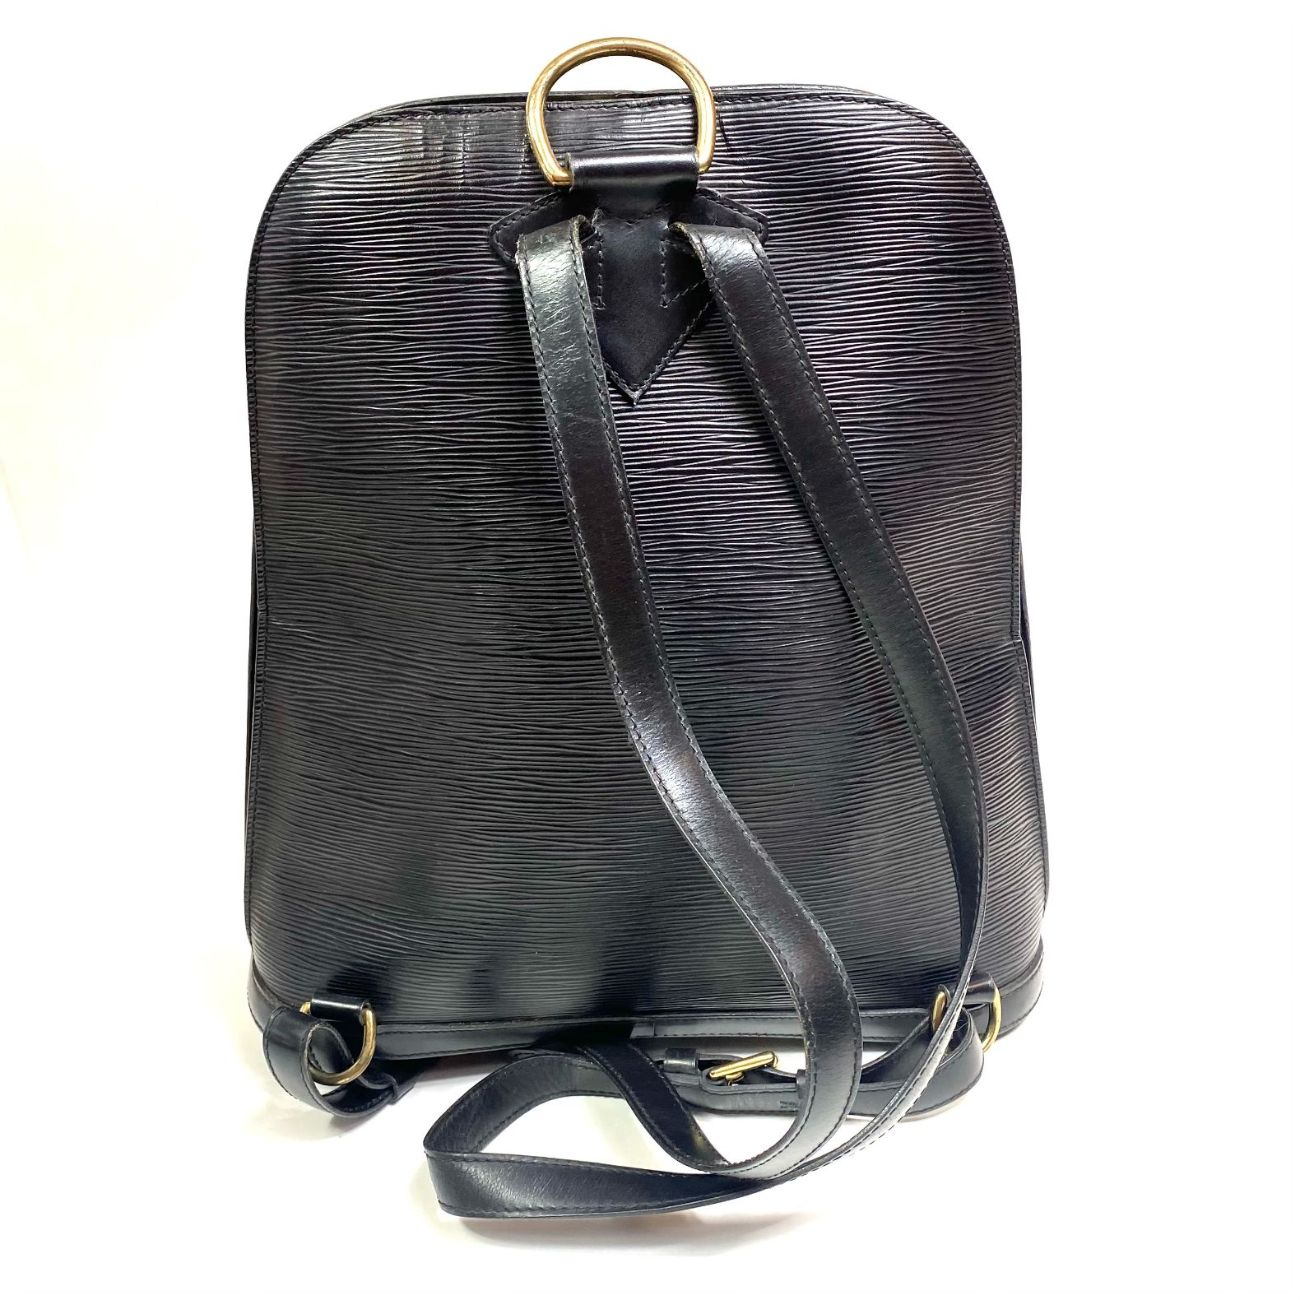 Mochila Louis Vuitton Gobelins Epi Preta